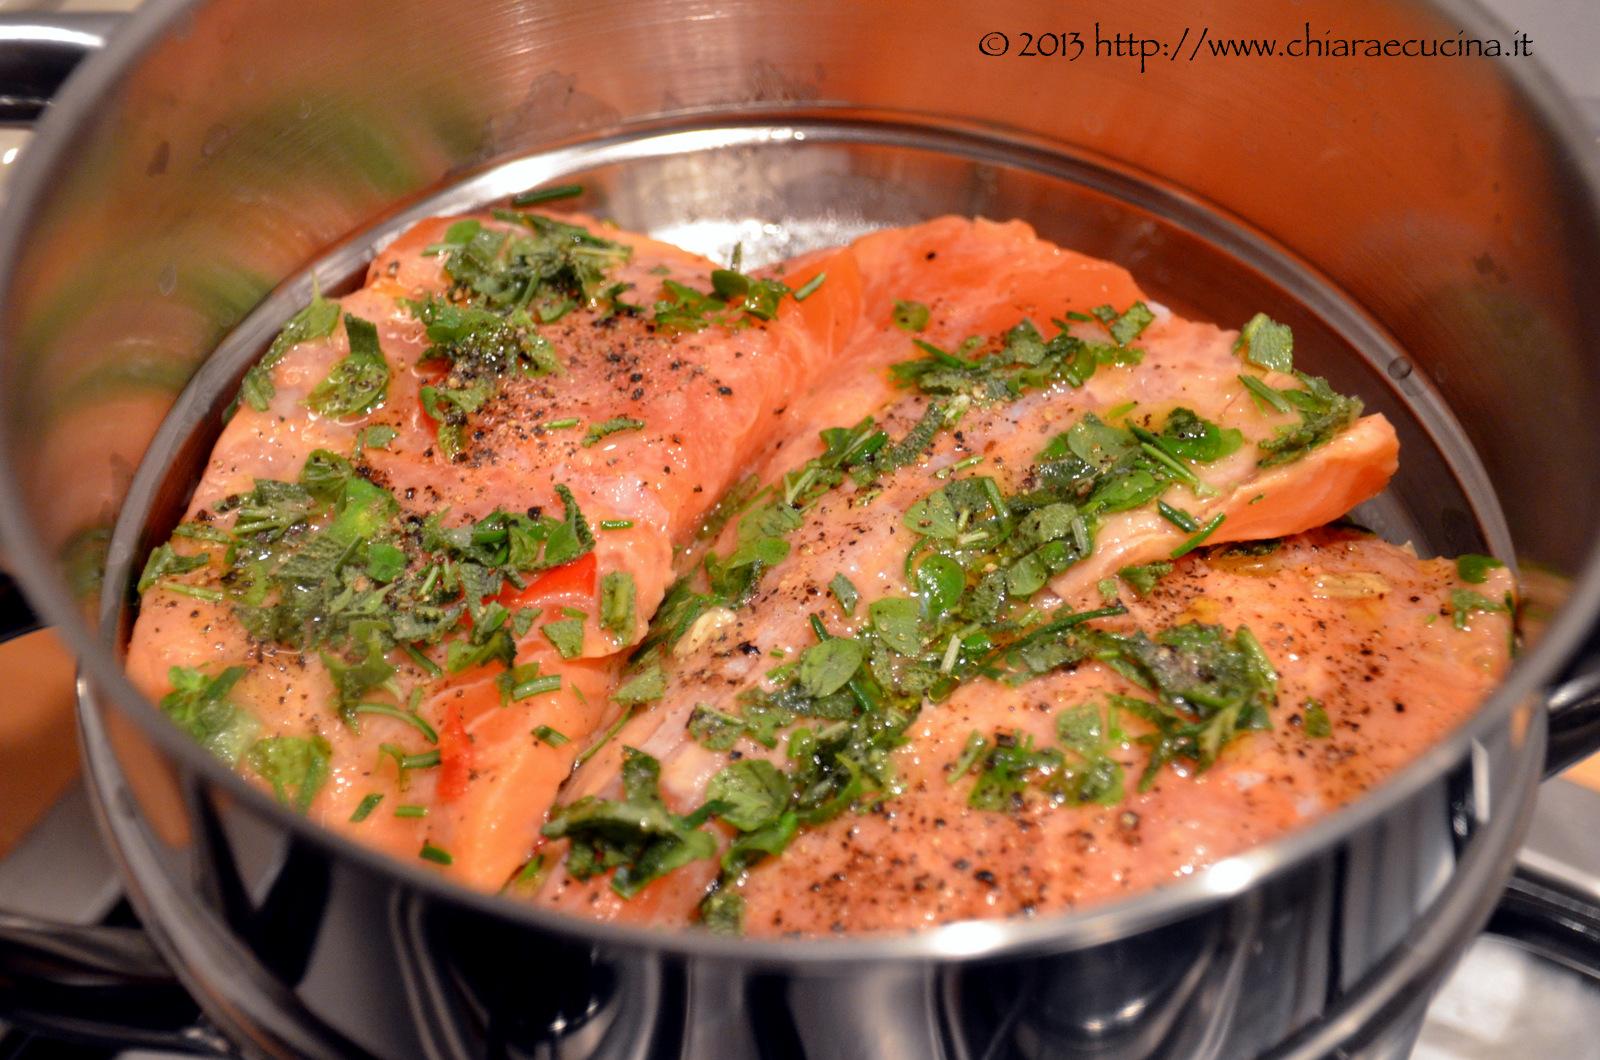 Salmone al vapore saporito chiara e cucina